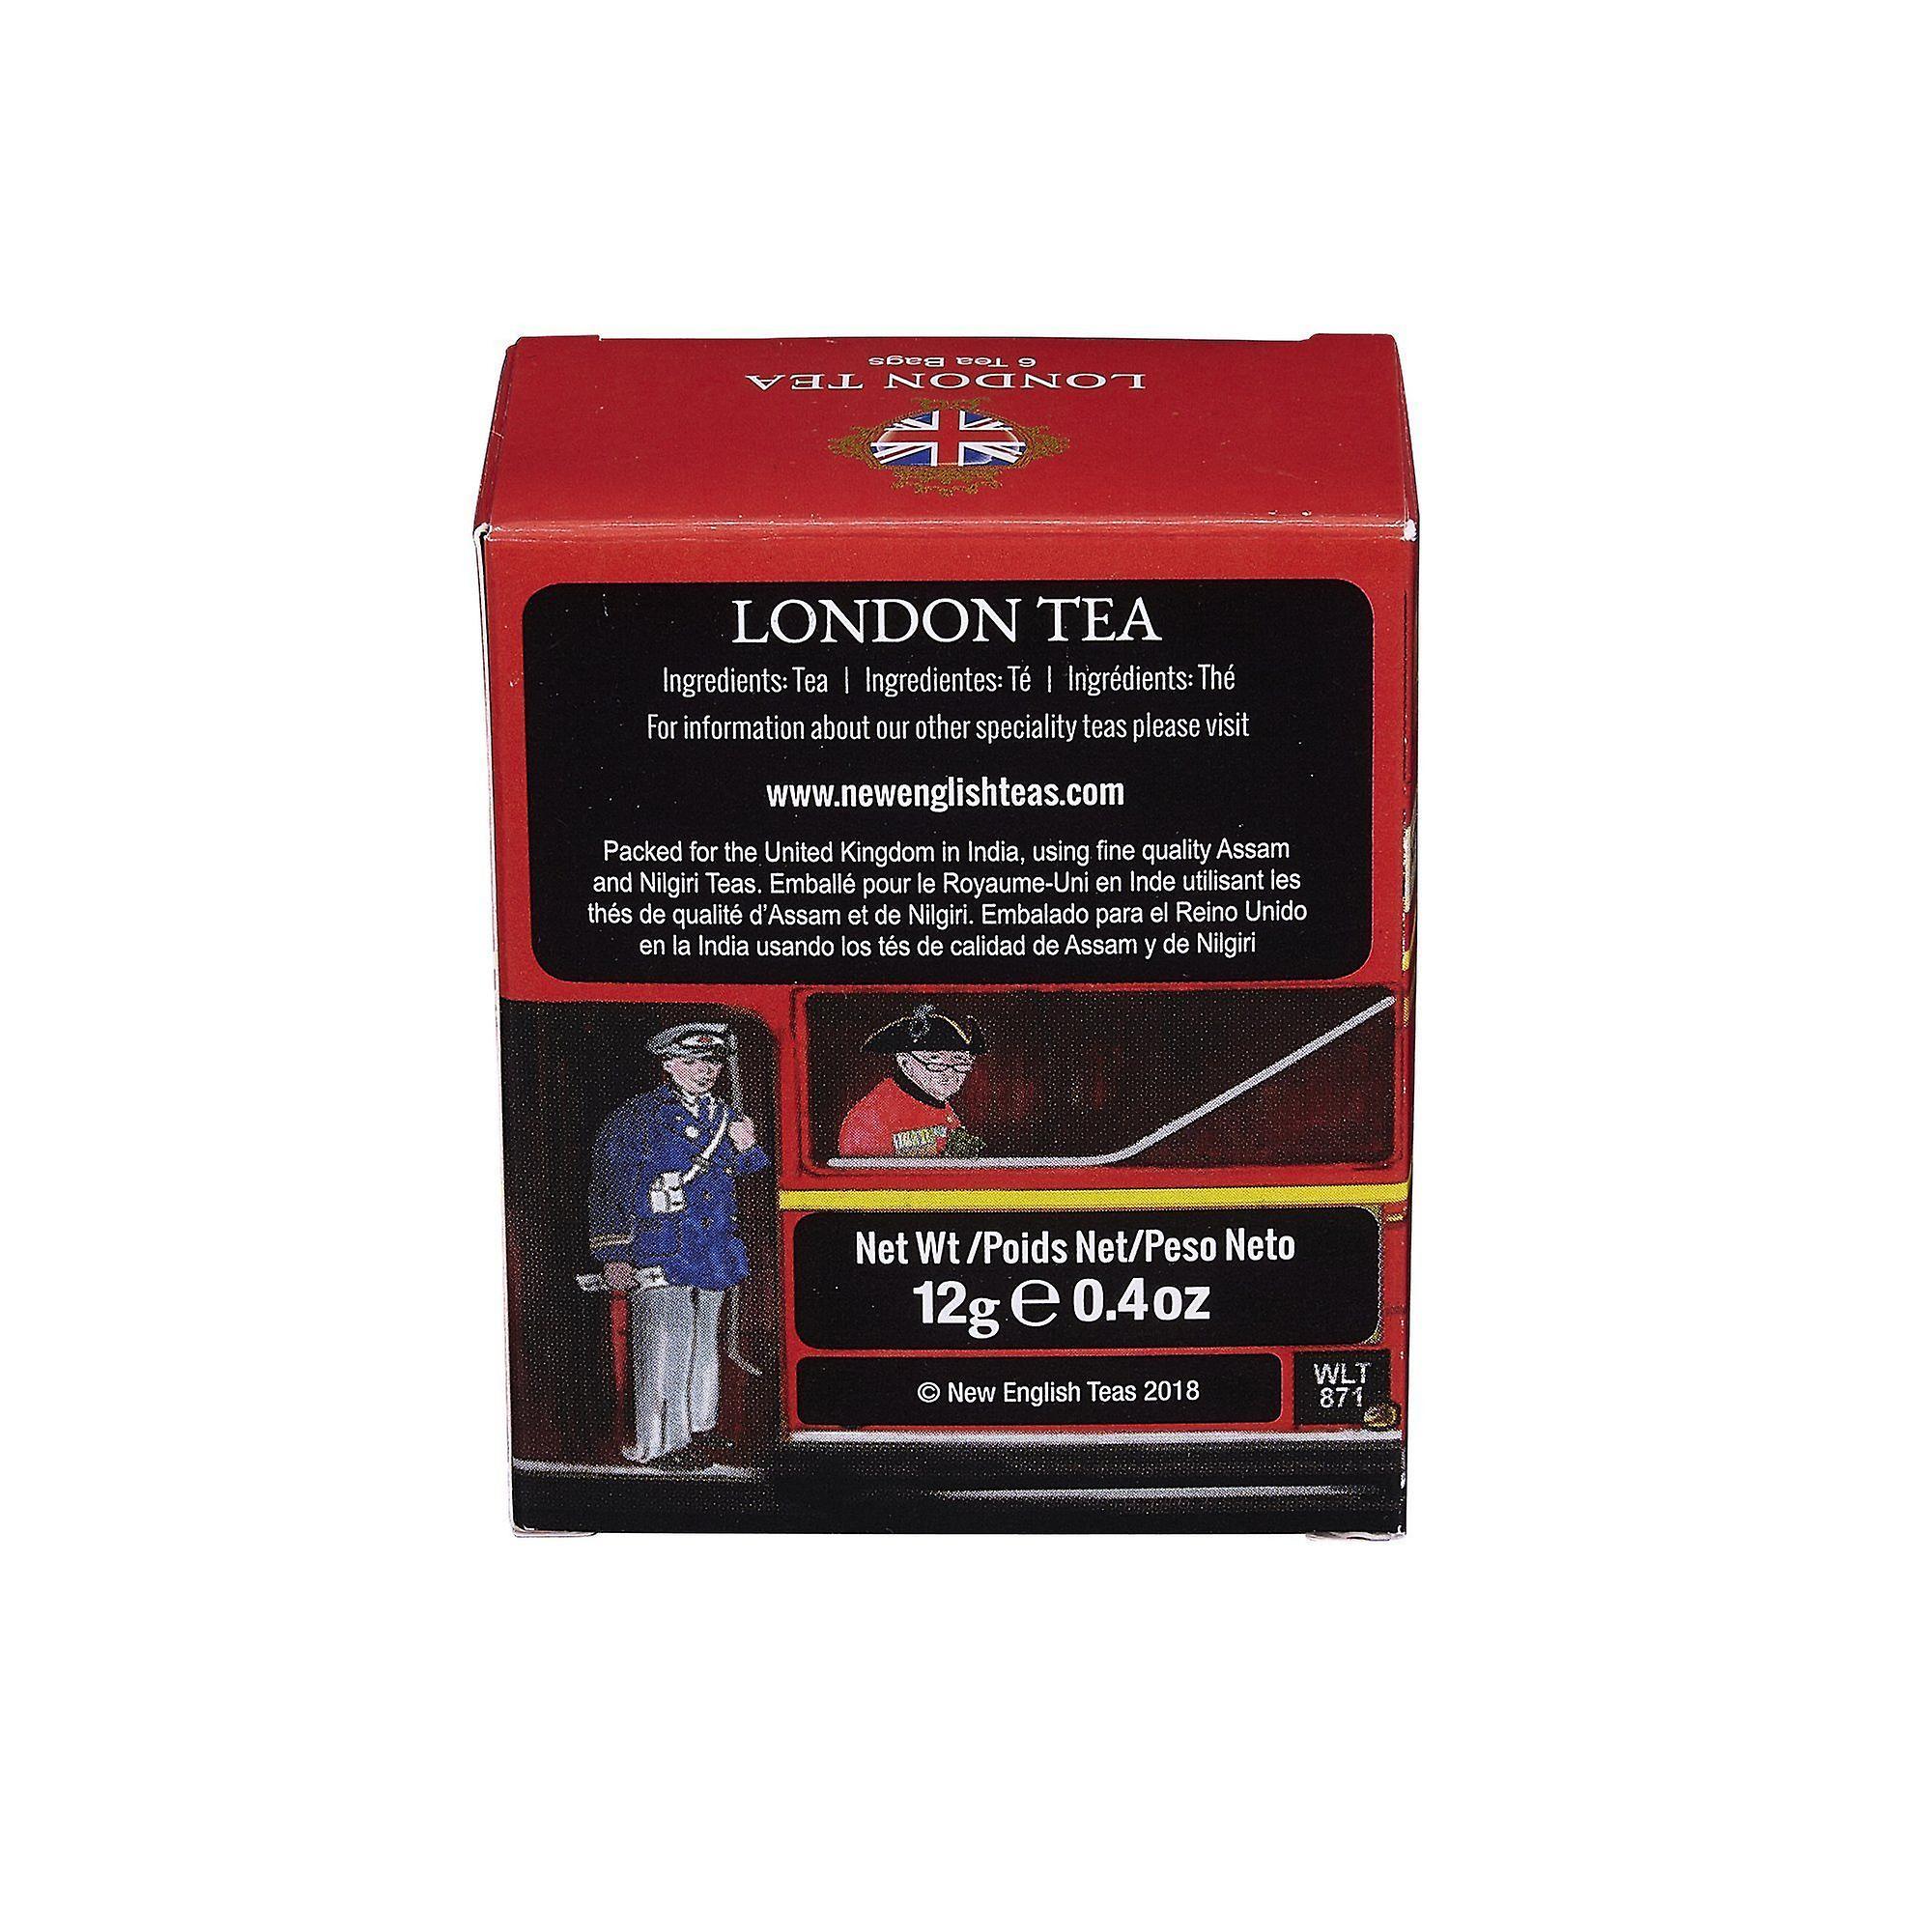 Red london bus london tea 6 teabag carton